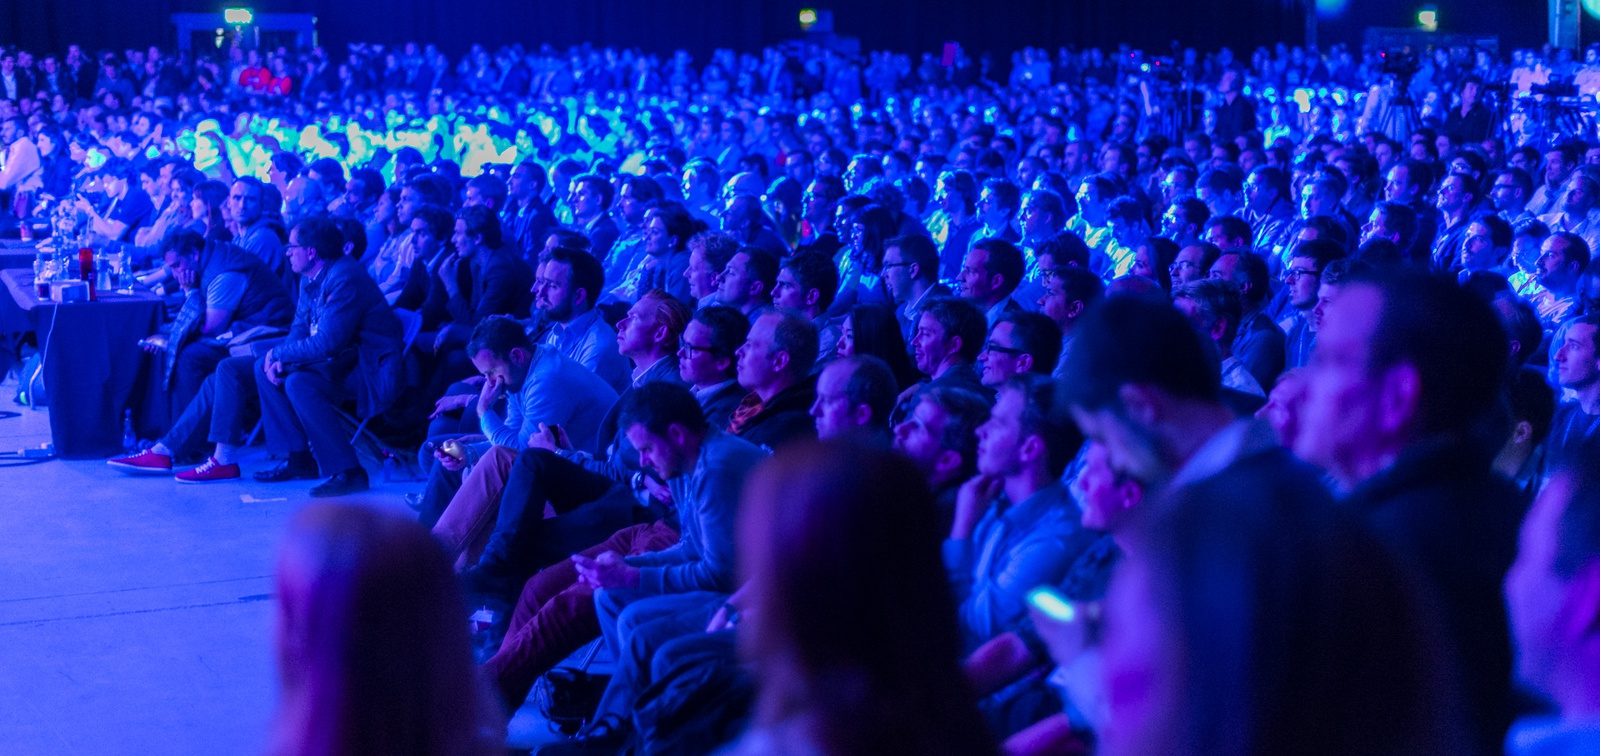 Smaller audiences, virtual venues: Changes coming to tech conferences